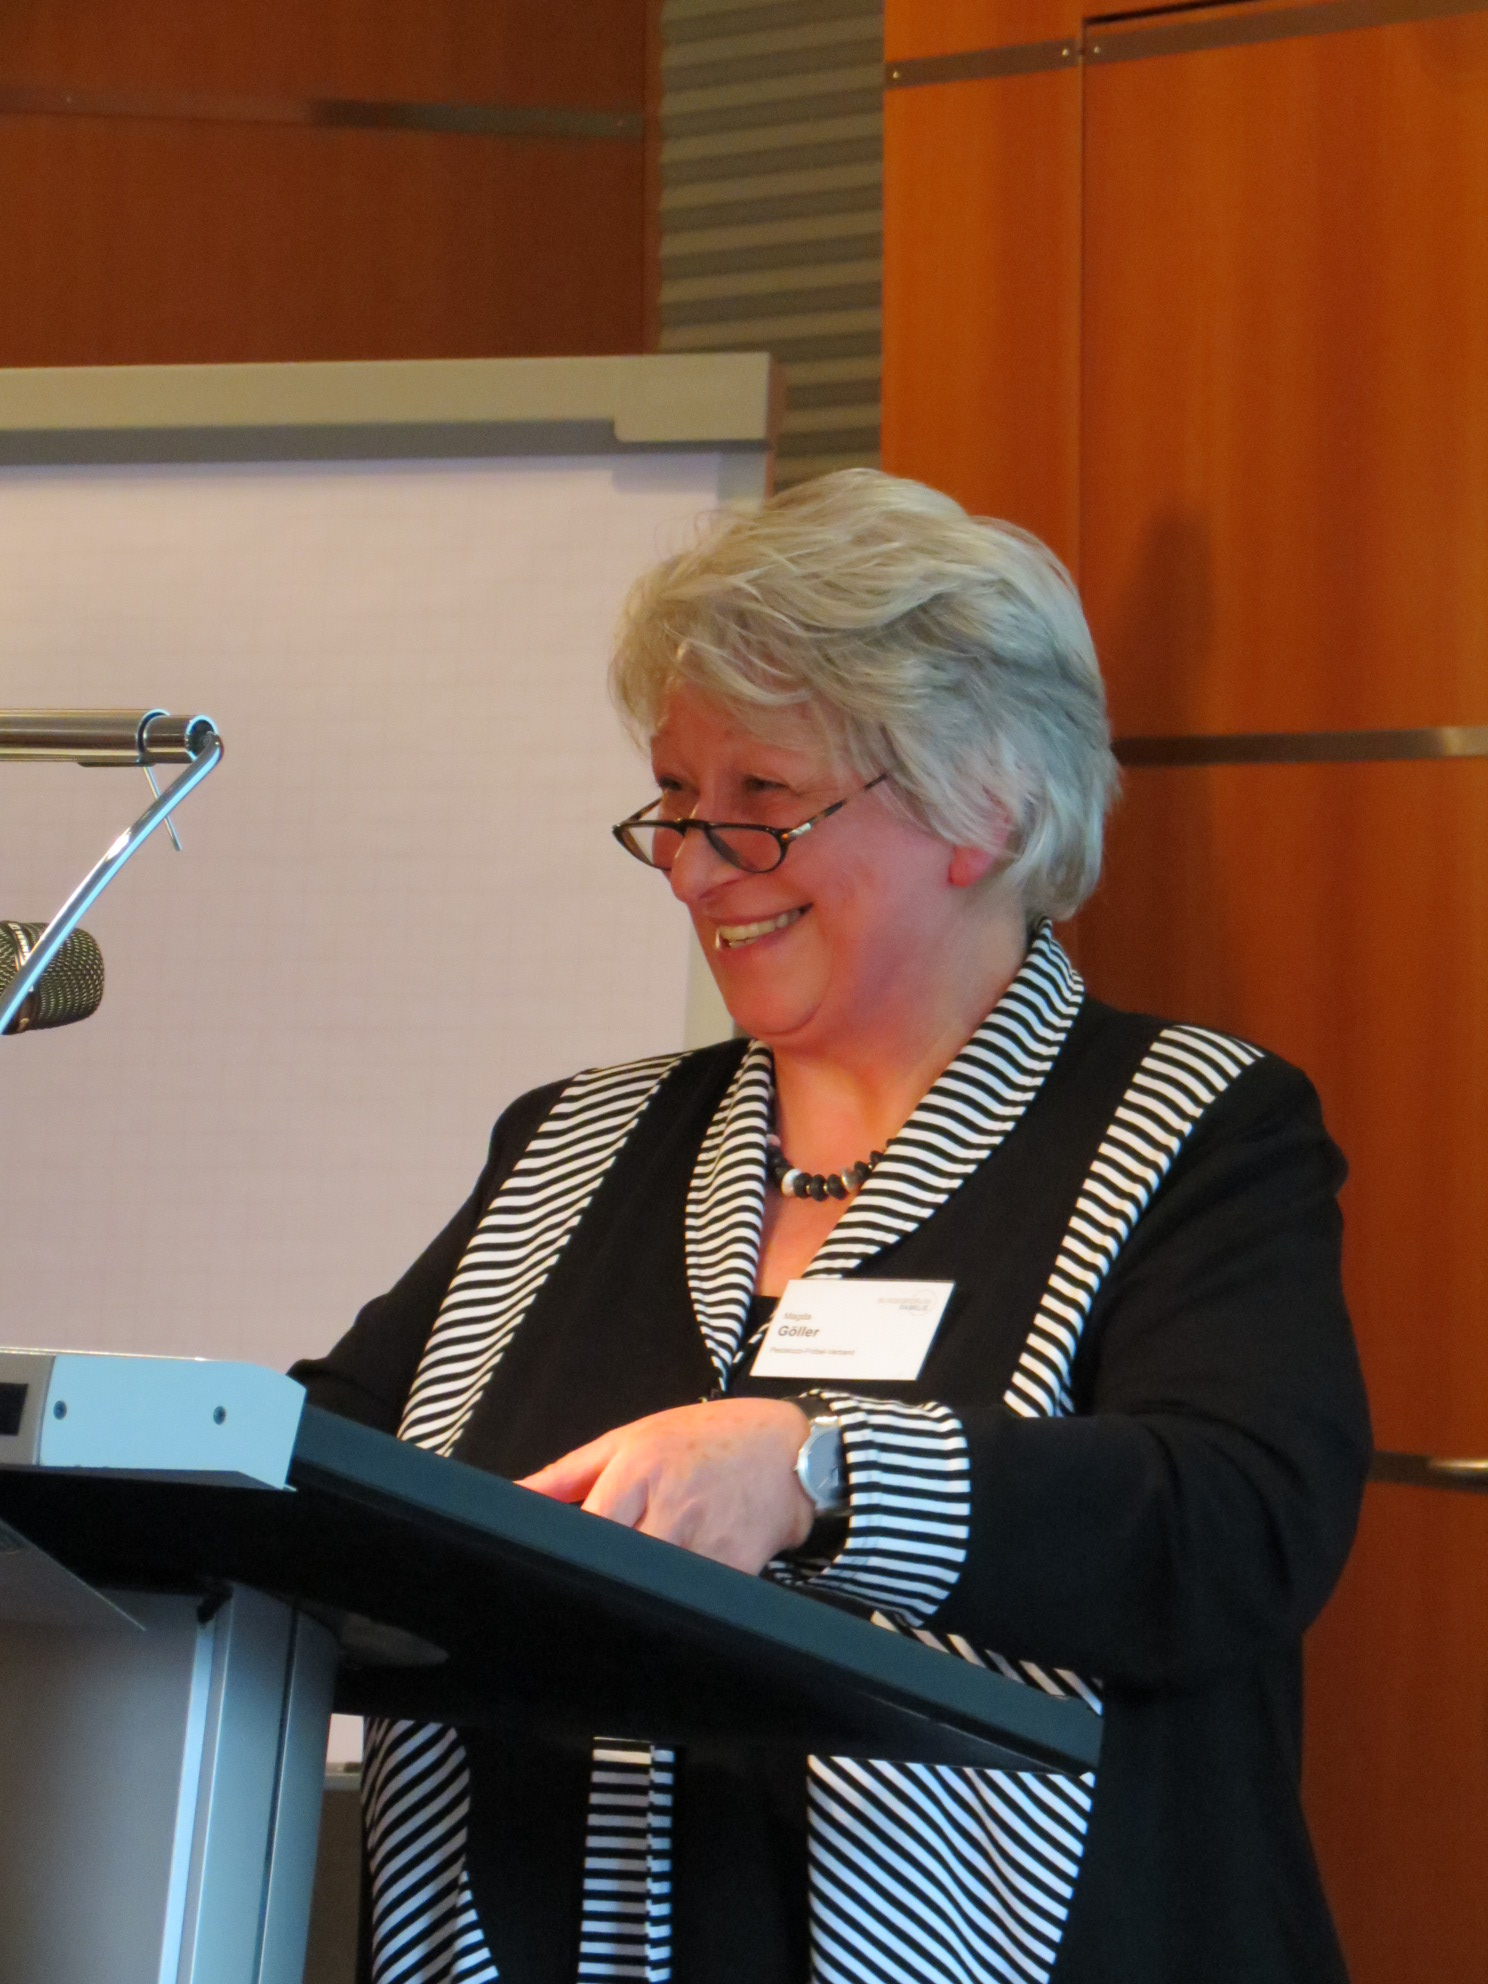 Magda Göller referiert